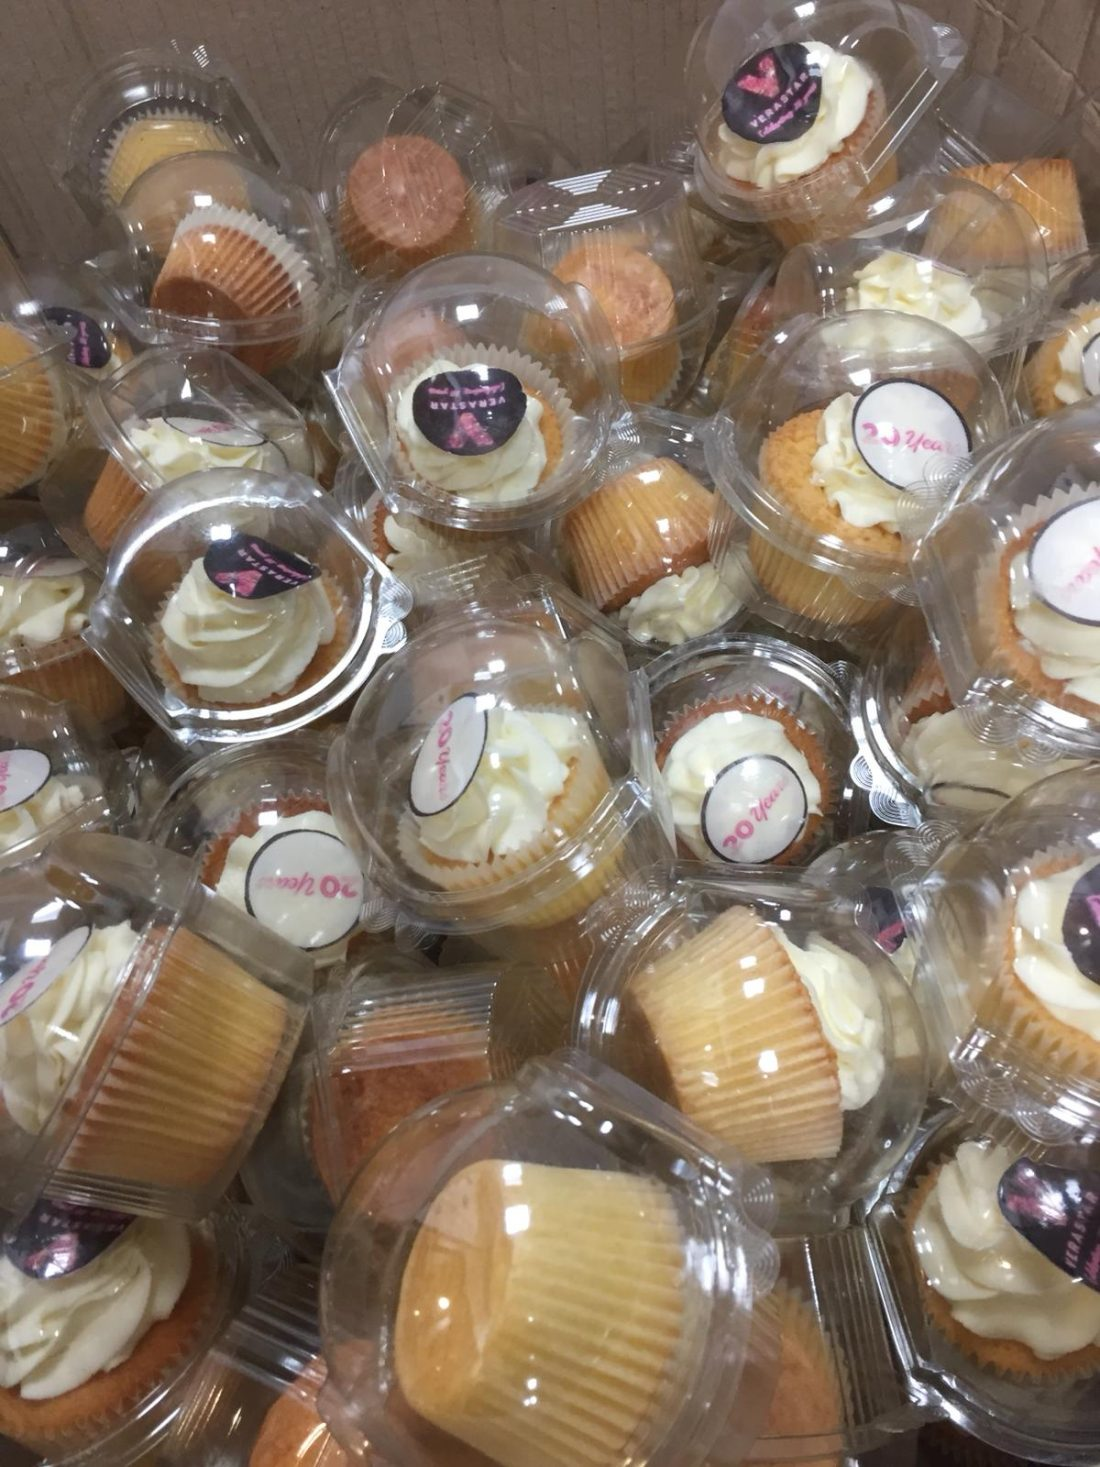 verastar-cupcakes.jpg